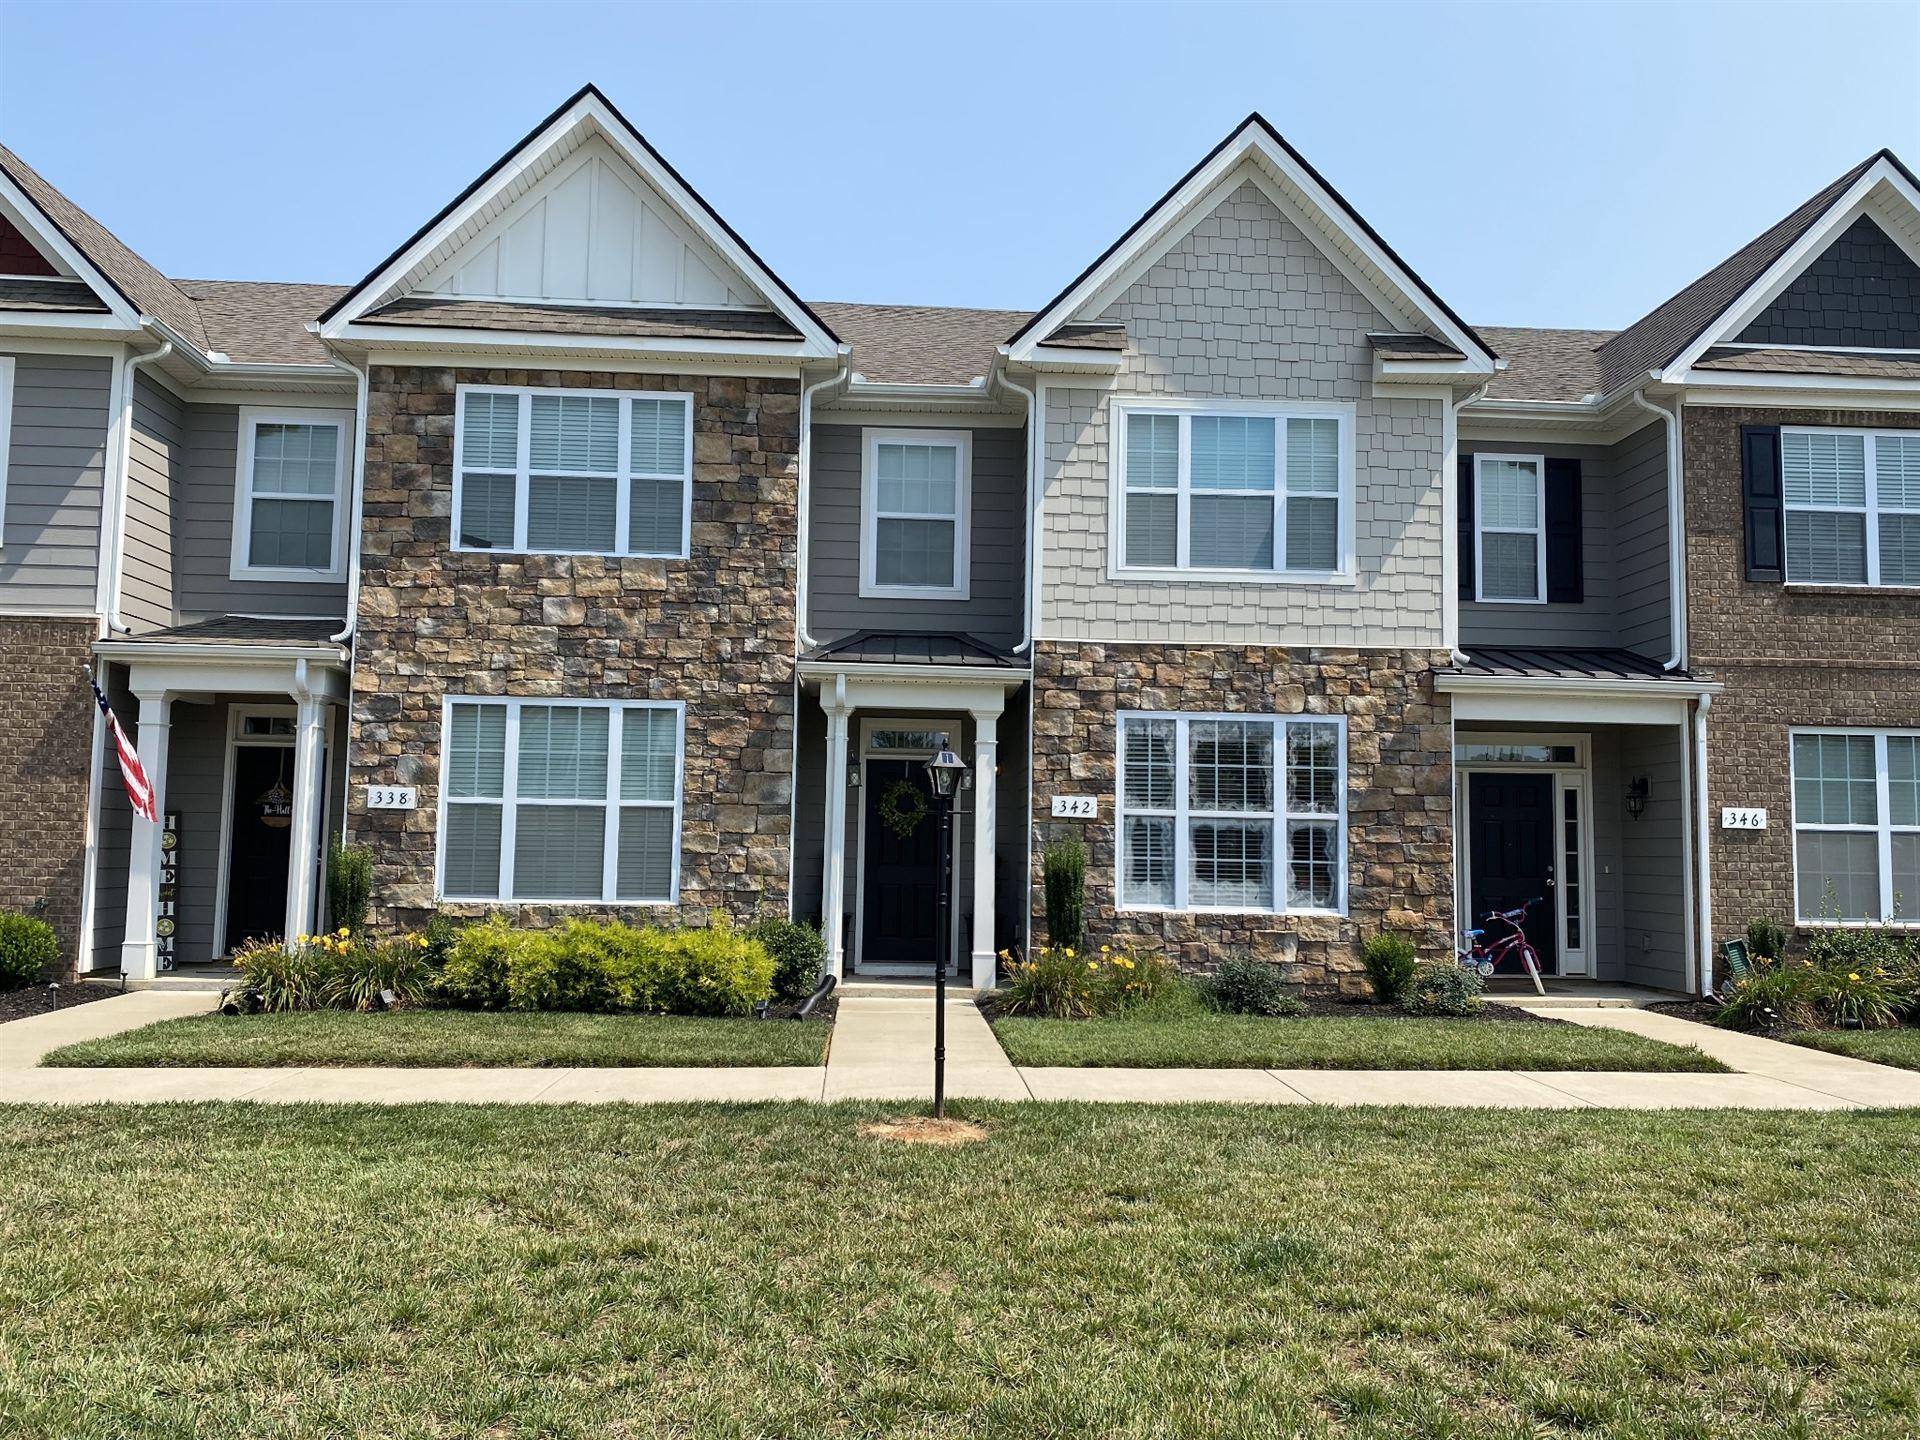 342 Manor Row, Pleasant View, TN 37146 - MLS#: 2276727